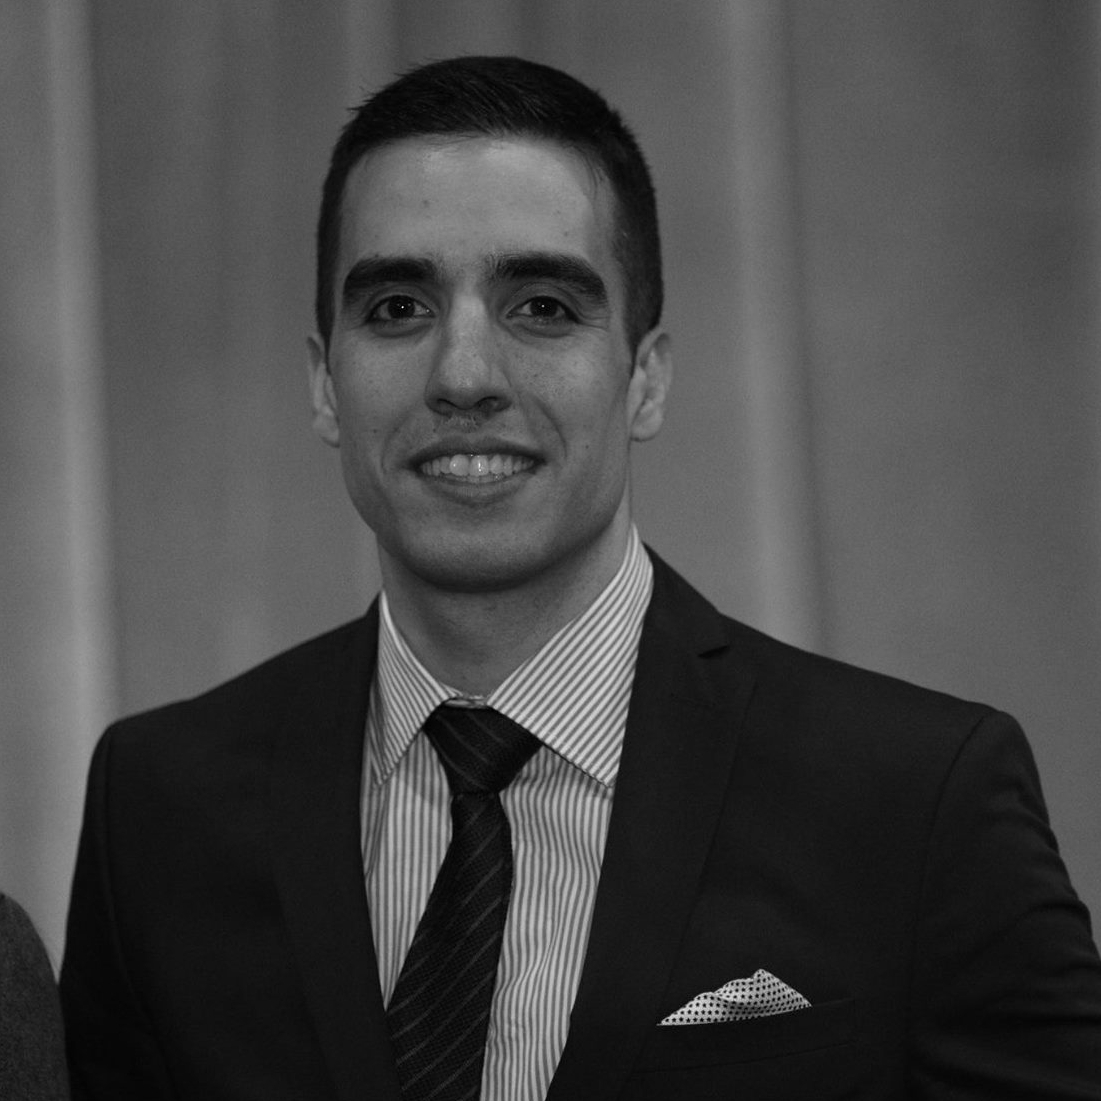 Omid Sadeghi, MBA - CEO, GenesisX